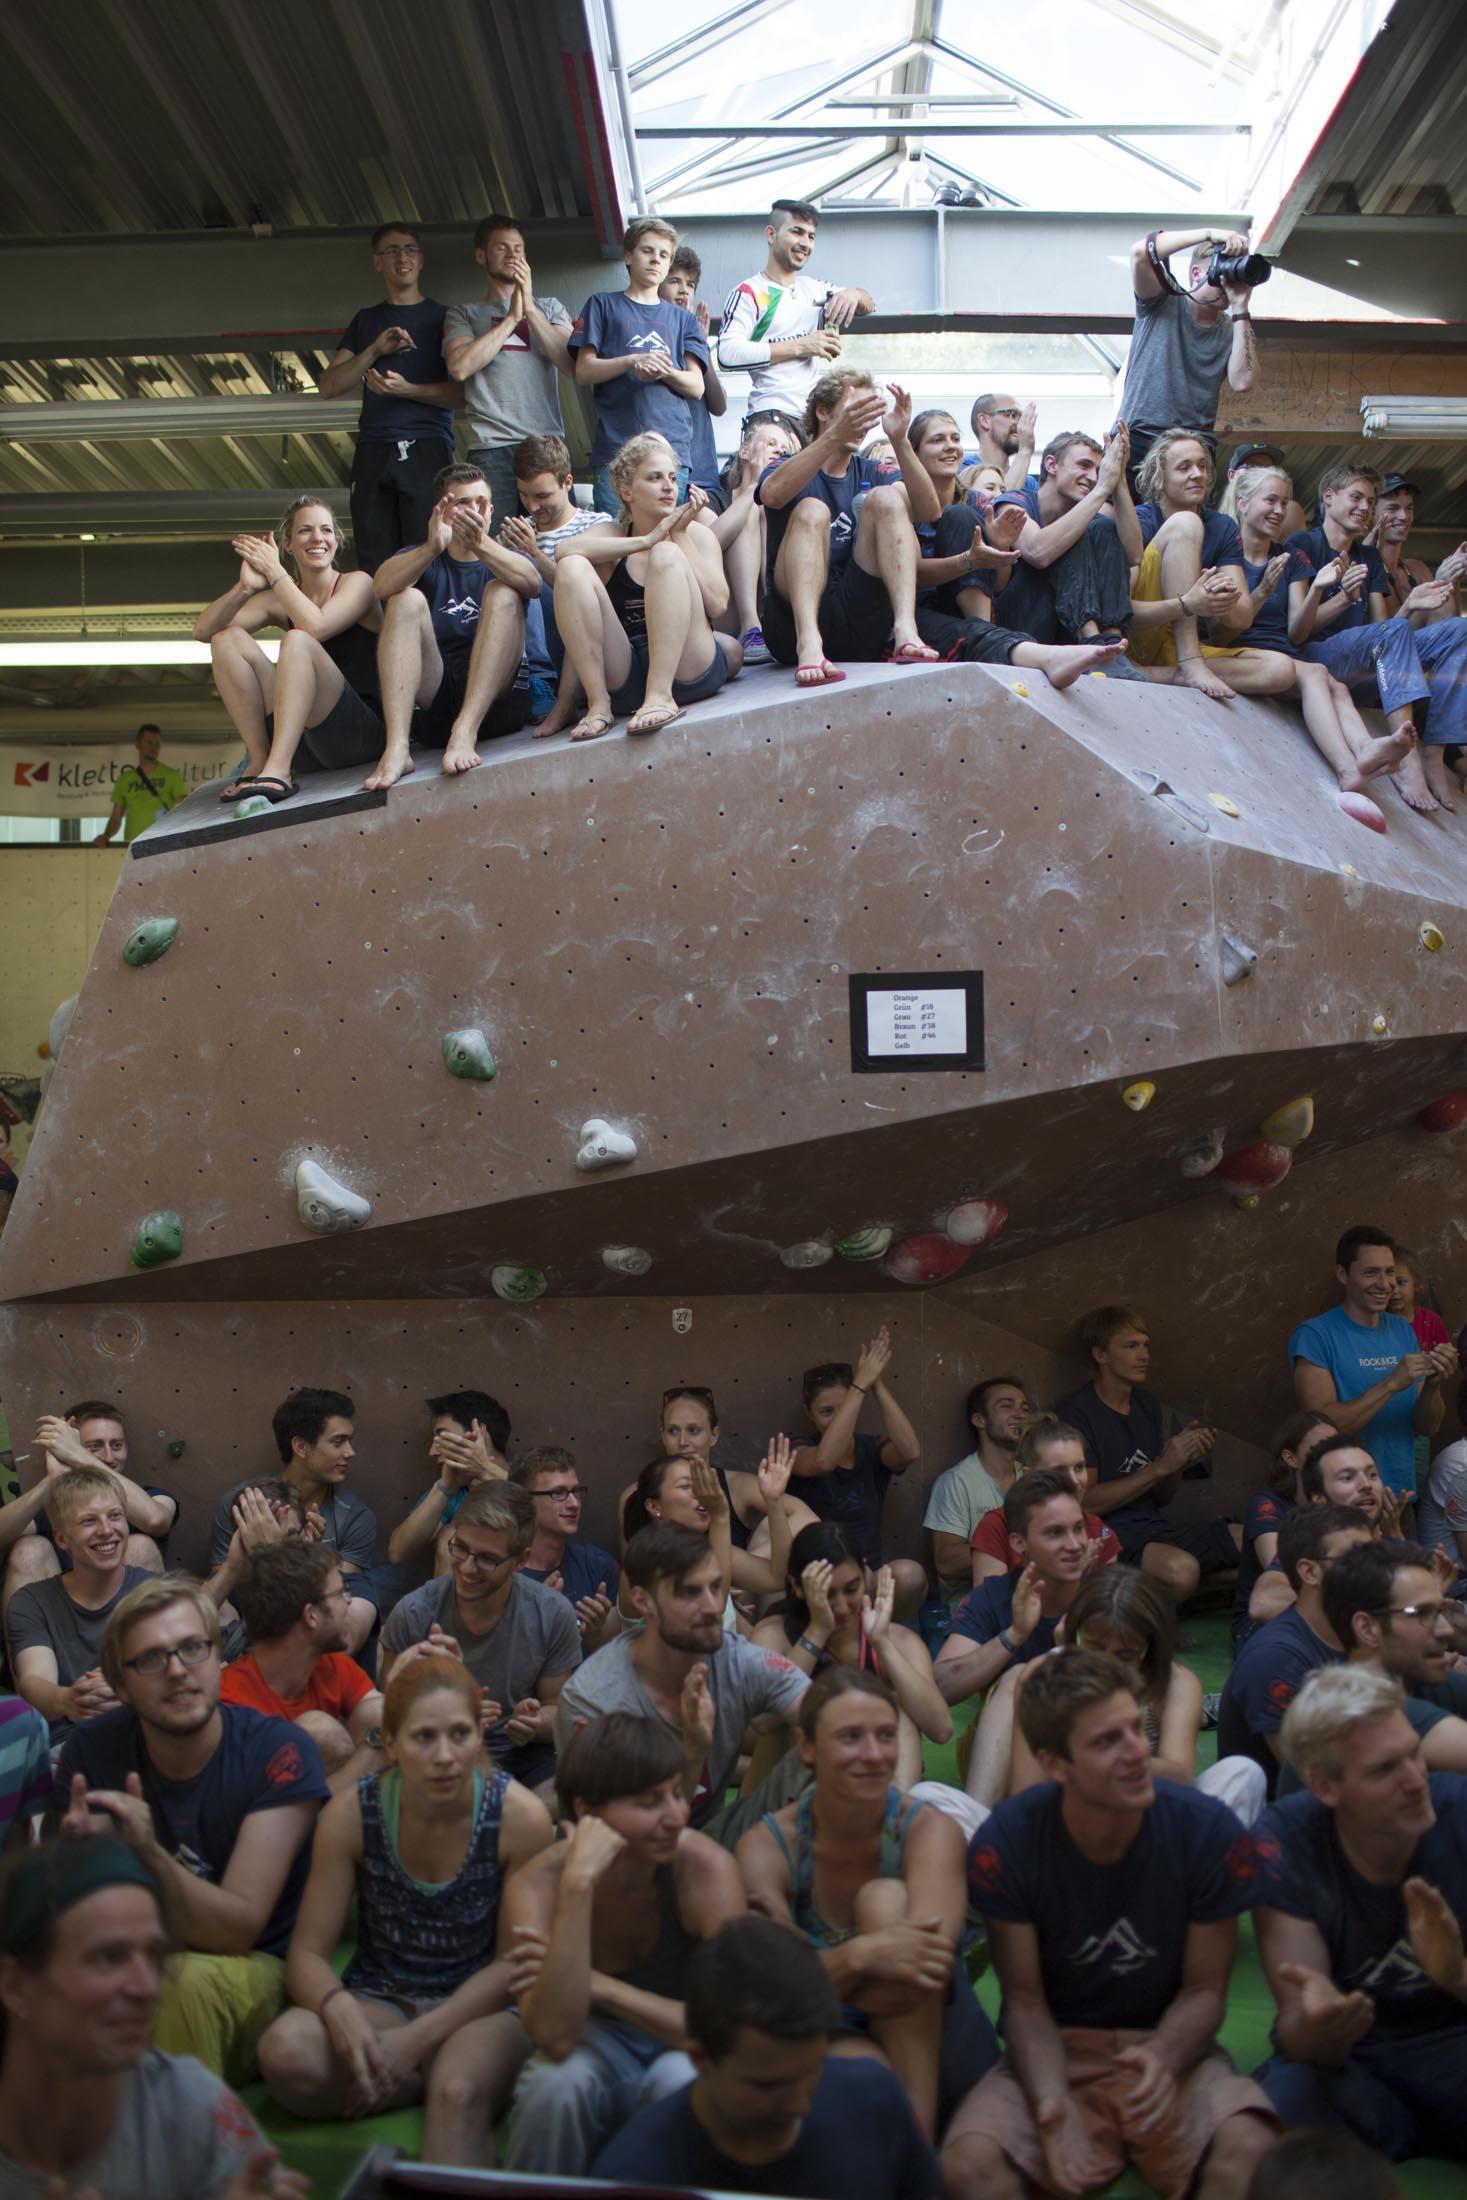 Finale, internationaler bouldercup Frankenjura 2016, BLOCKHELDEN Erlangen, Mammut, Bergfreunde.de, Boulderwettkampf07092016542